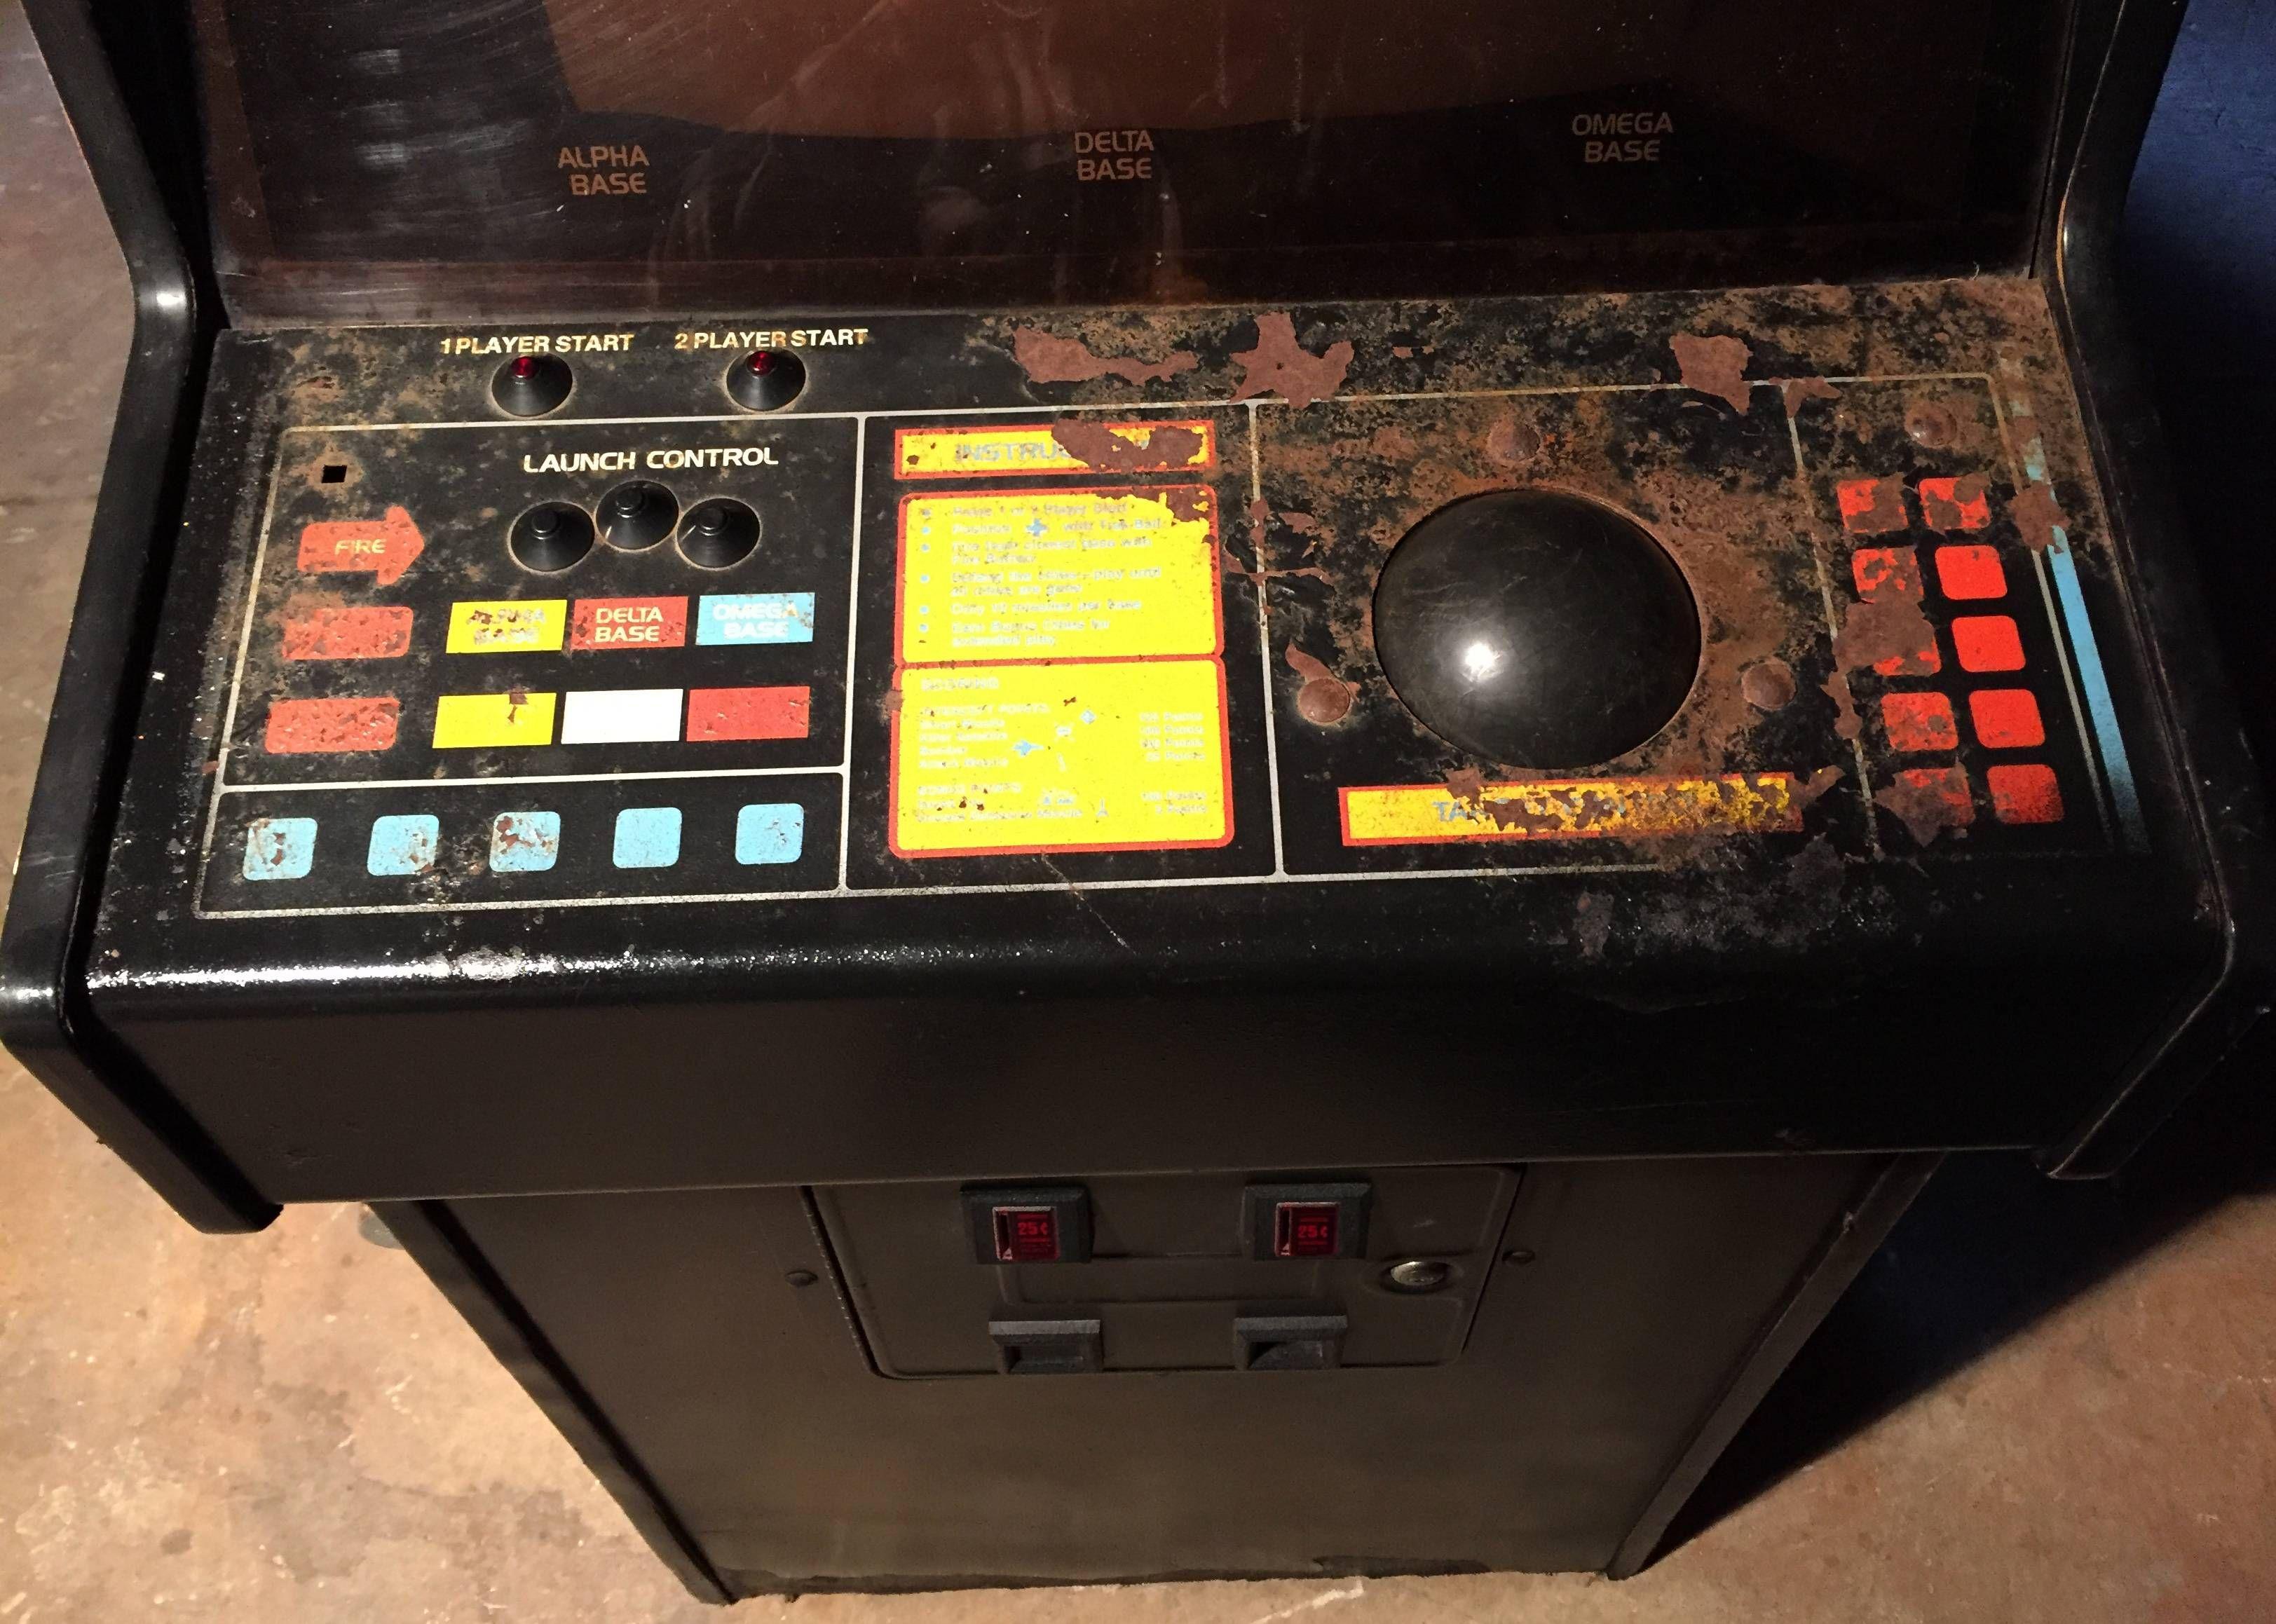 Carolina Gaming Company - My new Atari Missile Command ...